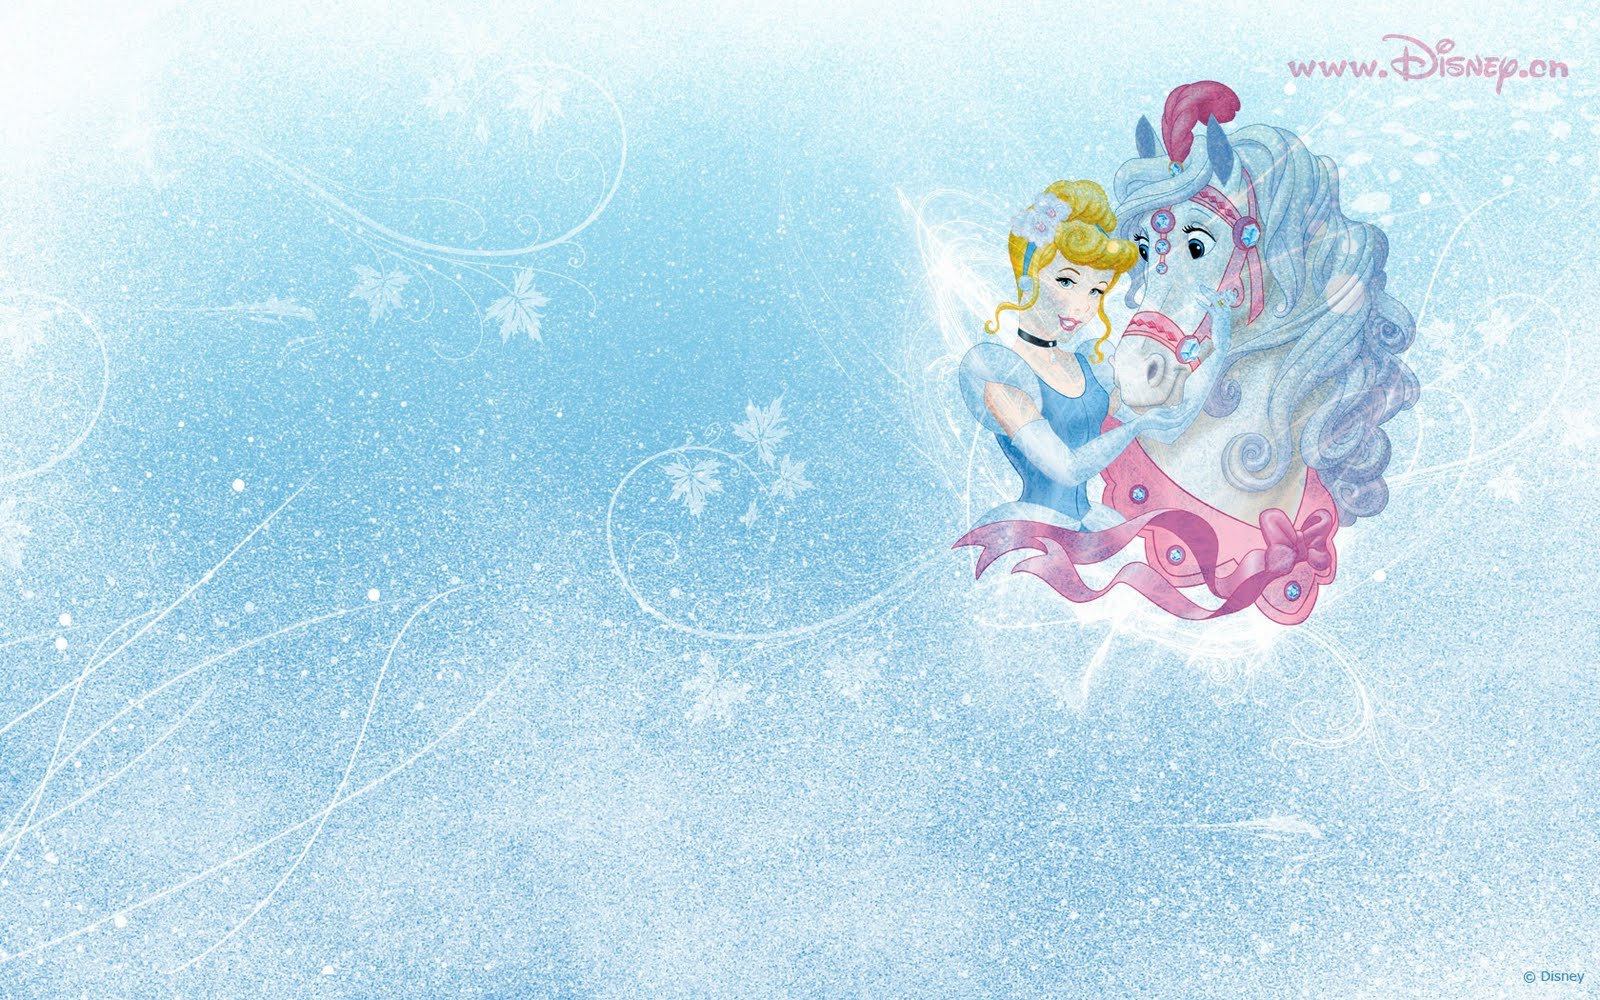 Fondos De Pantalla De Disney: Wallpapers Photo Art: Disney Princess Wallpaper, Disney